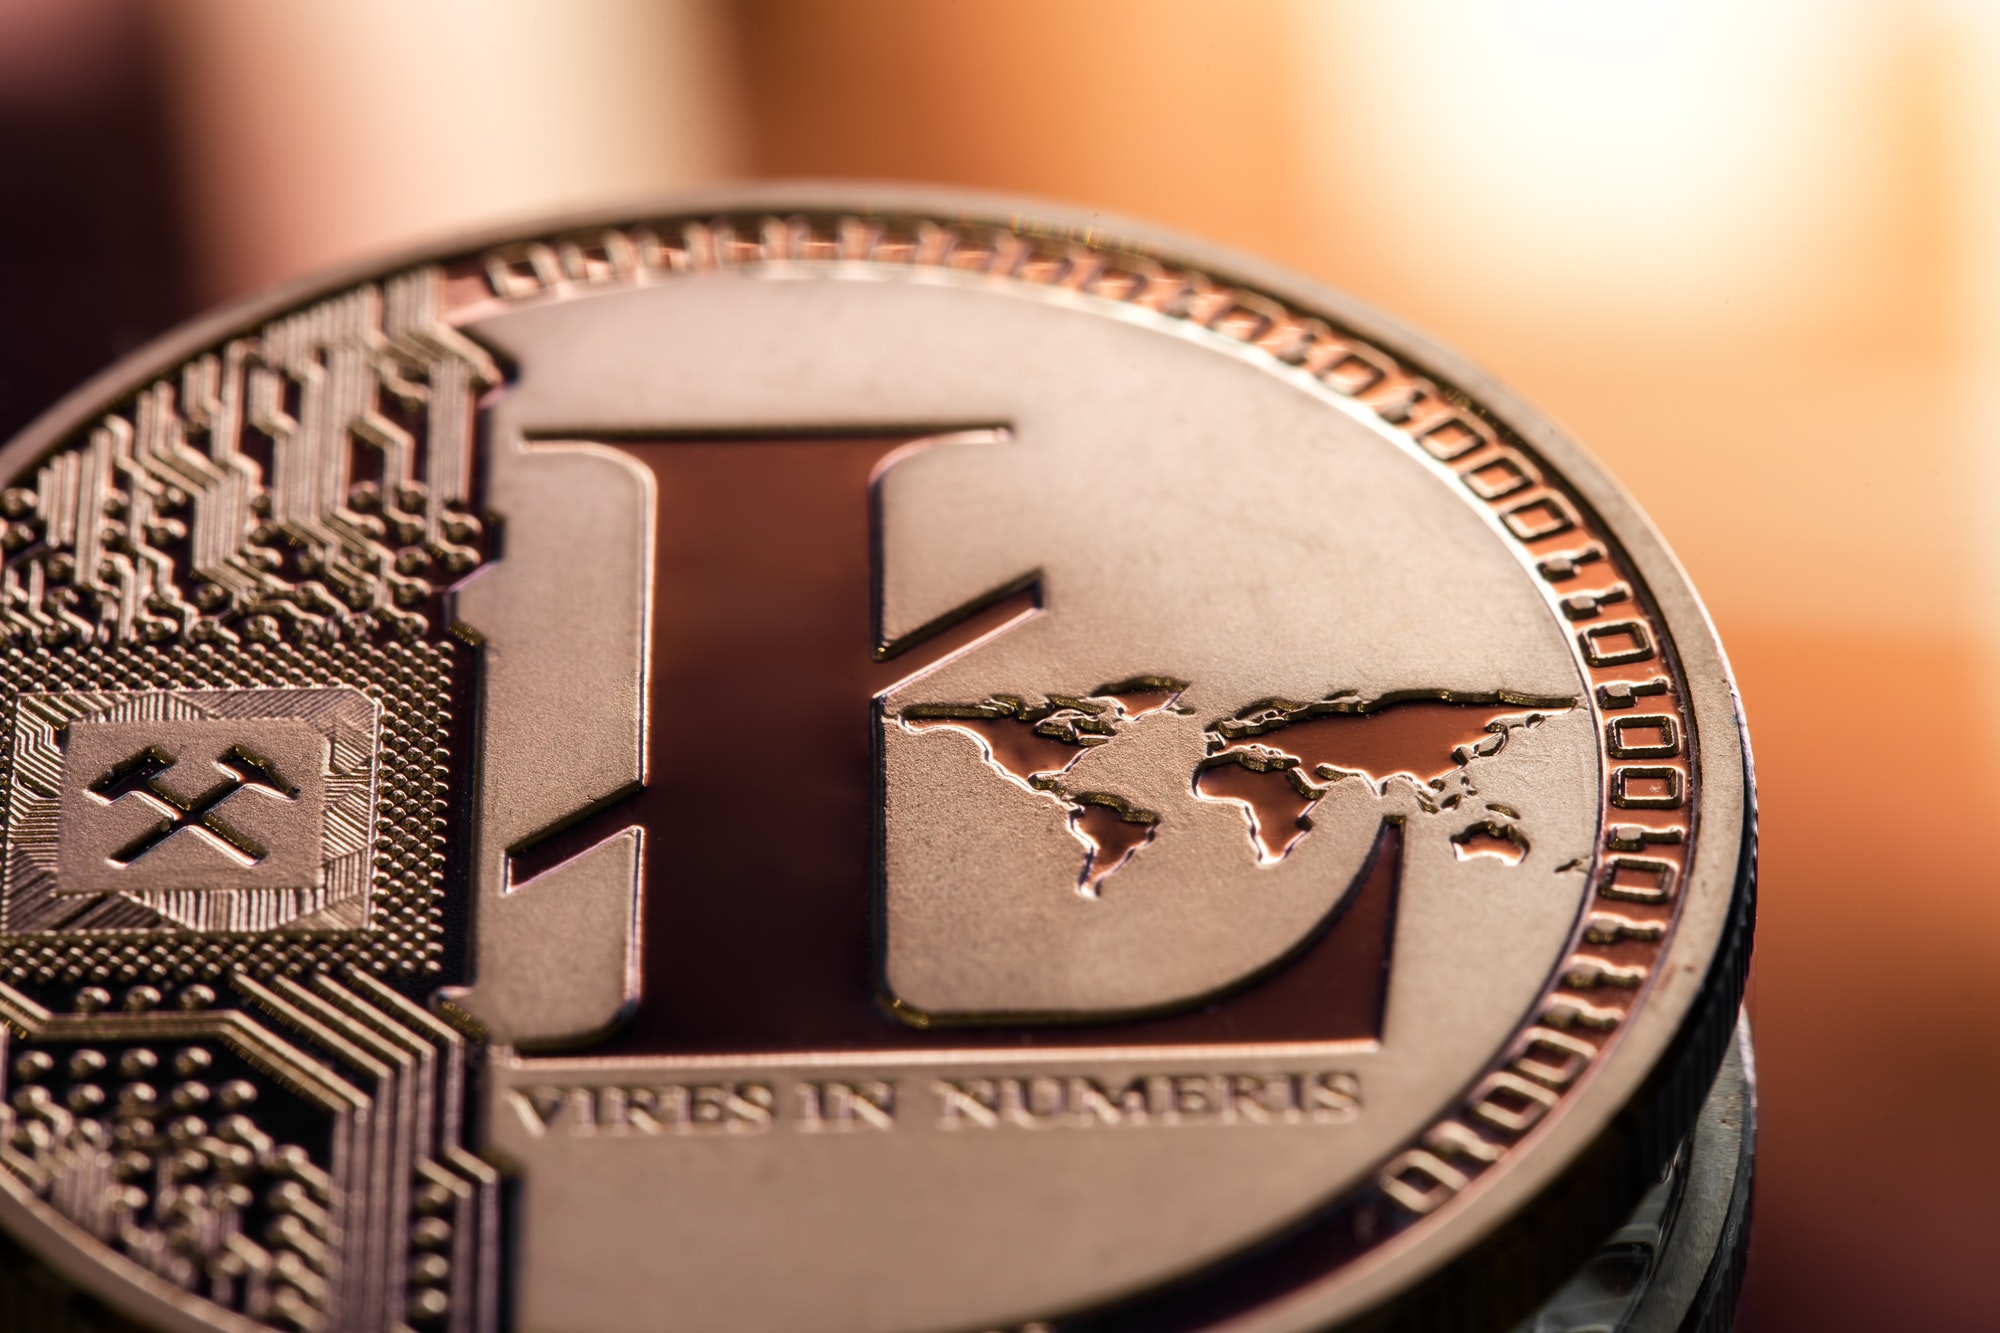 Coin litecoin closeup on a beautiful background.